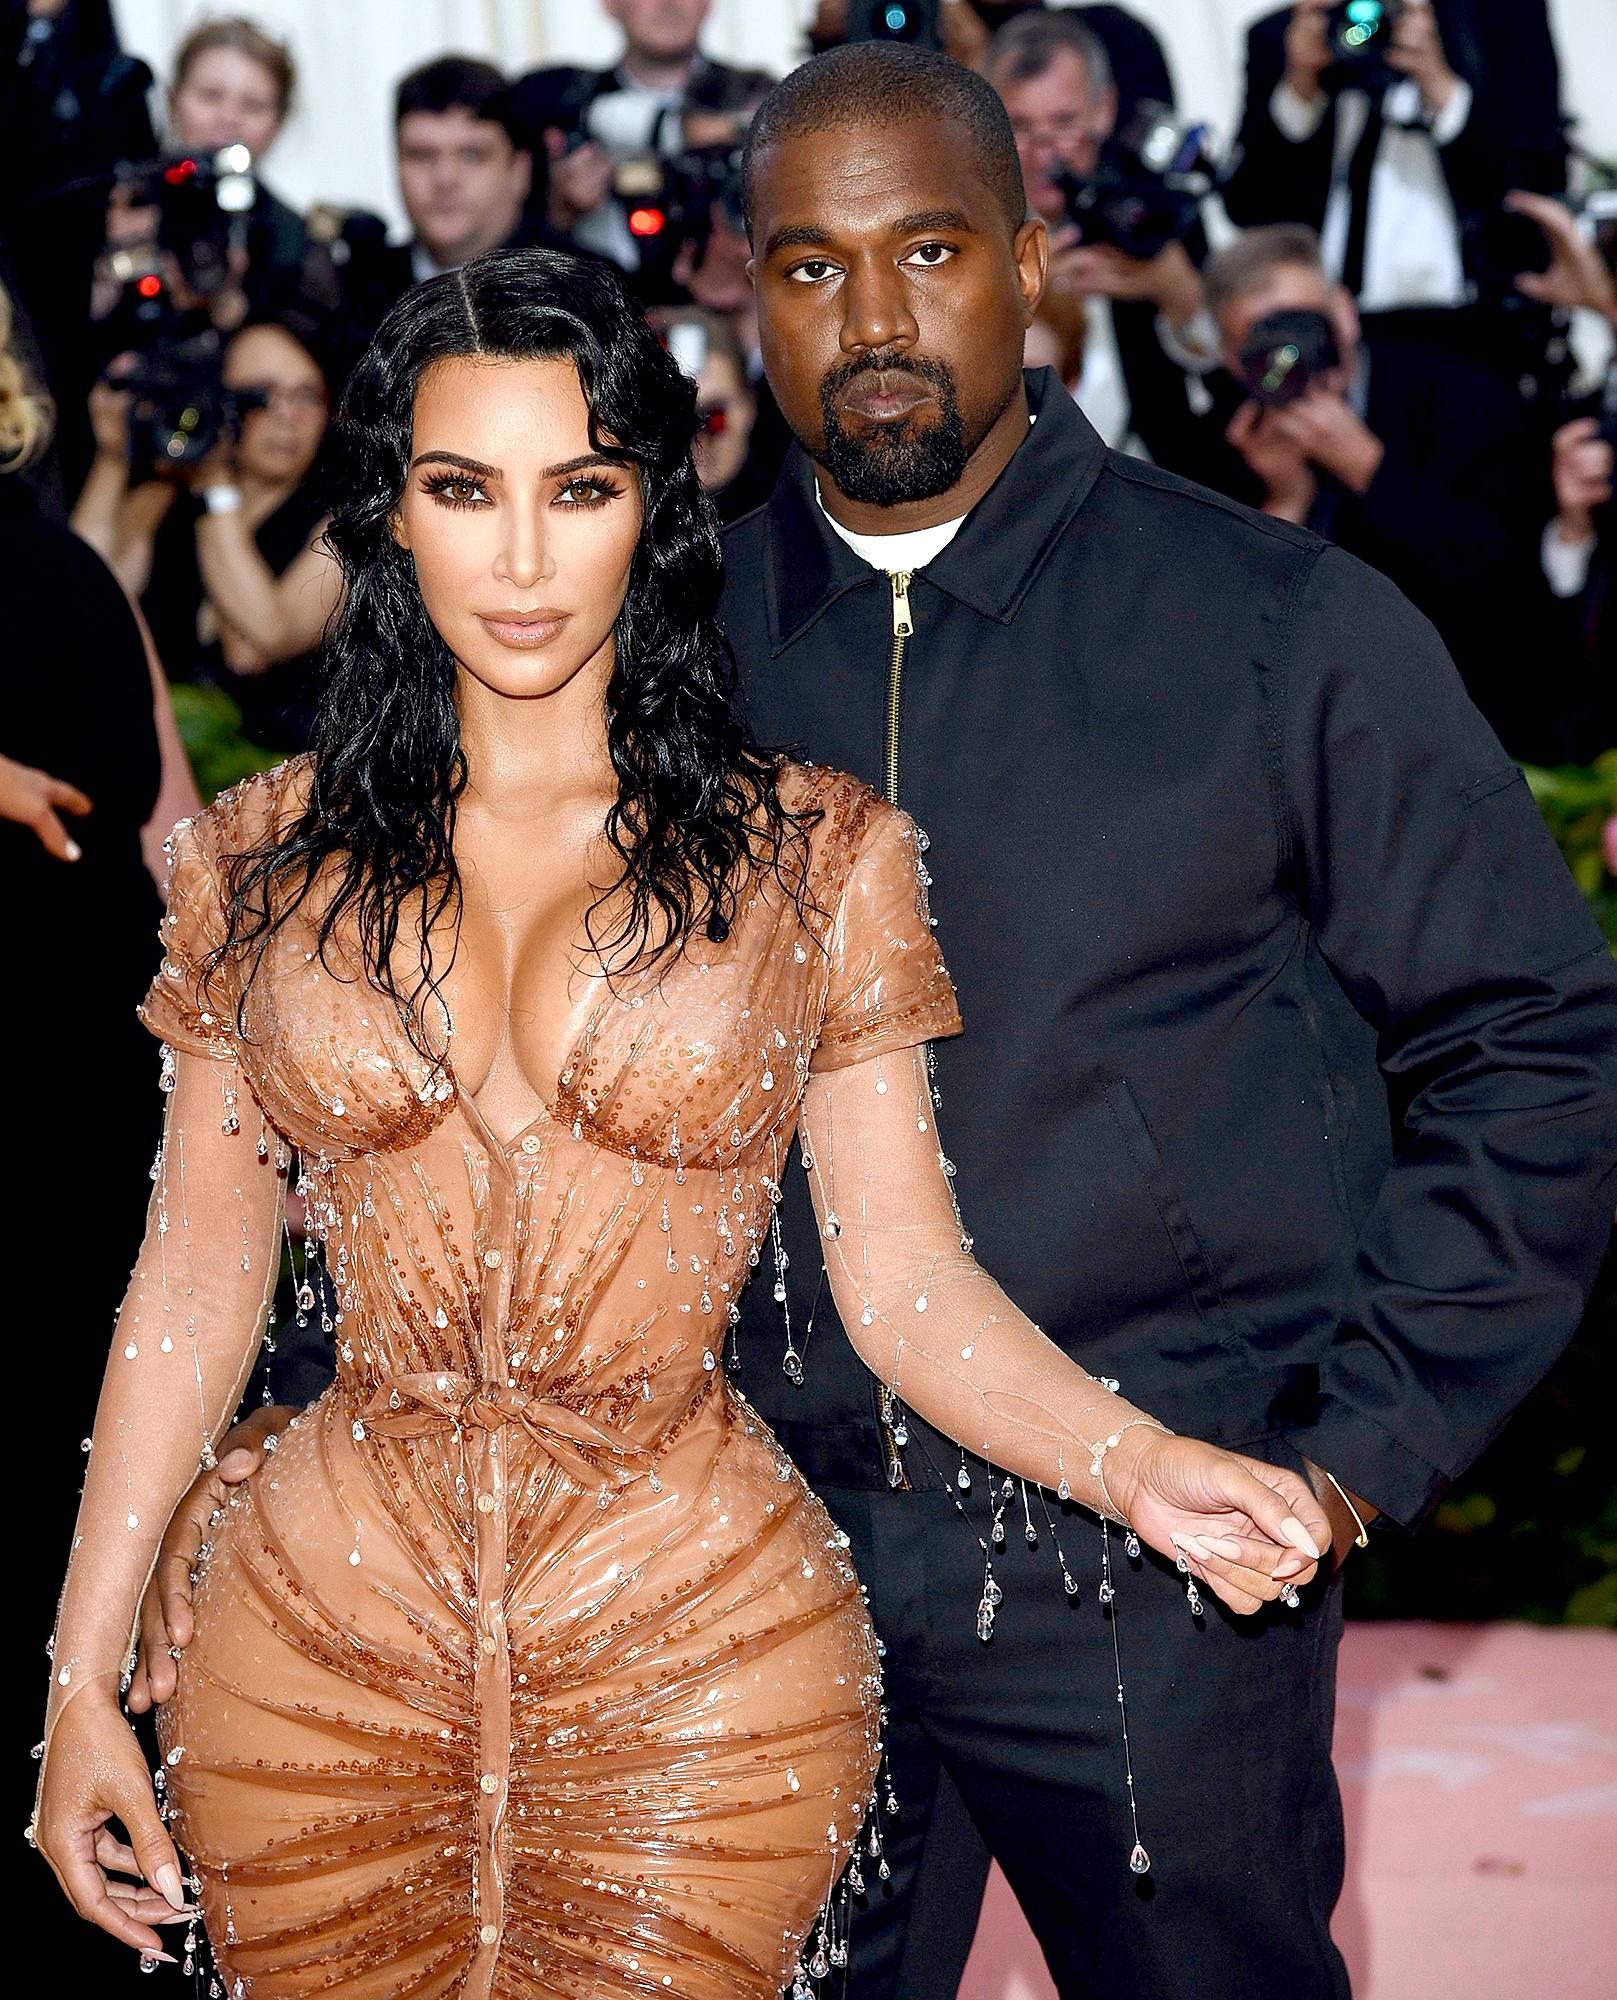 Kris Jenner How Kim Kardashian Is Coping Amid Kanye West Divorce